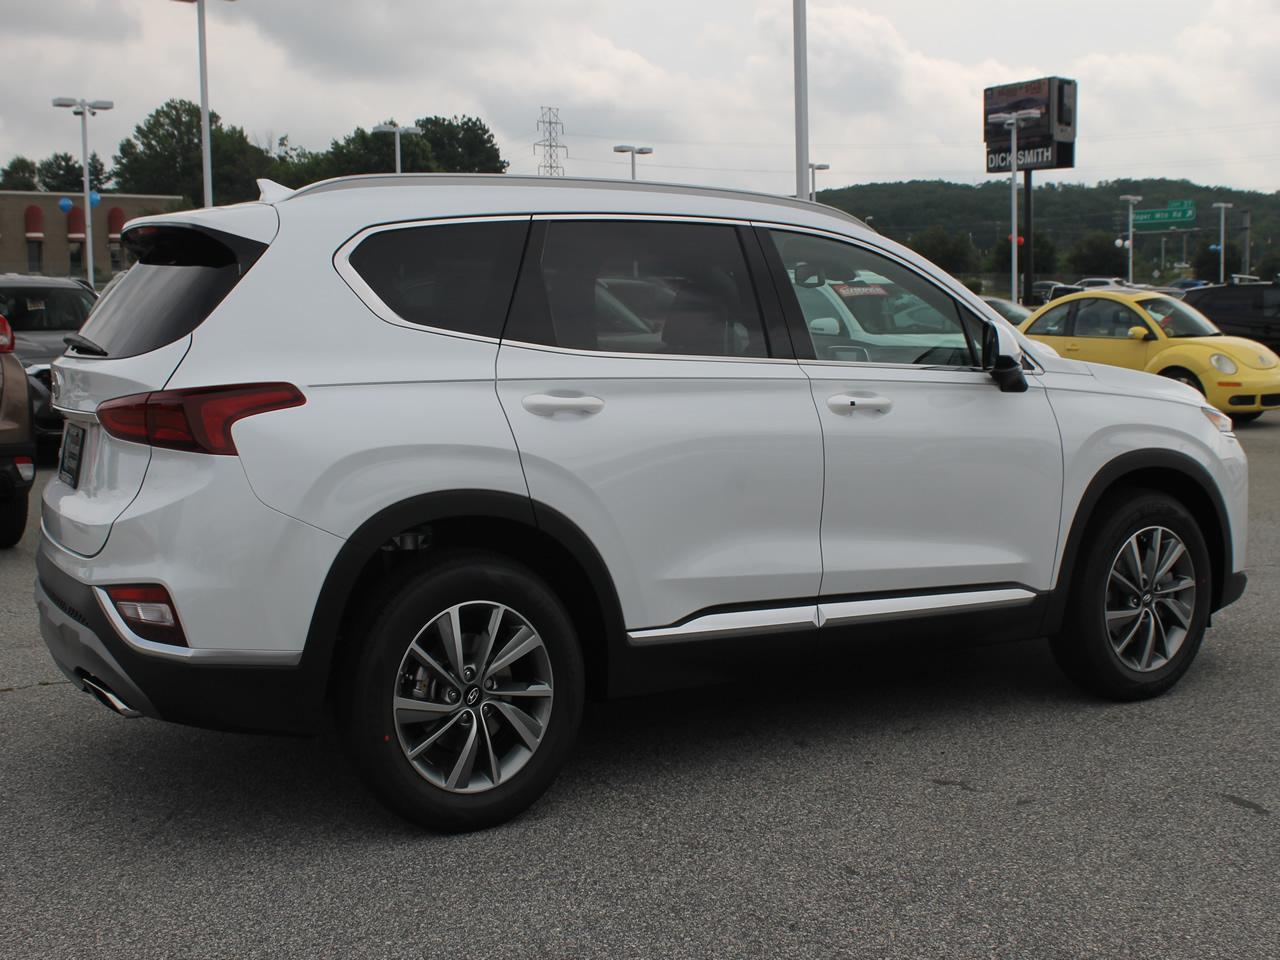 Dick Smith Hyundai >> NEW 2019 HYUNDAI SANTA FE SEL PLUS 2.4 VIN 5NMS33ADXKH008970 - Hyundai in Greenville | Hyundai ...